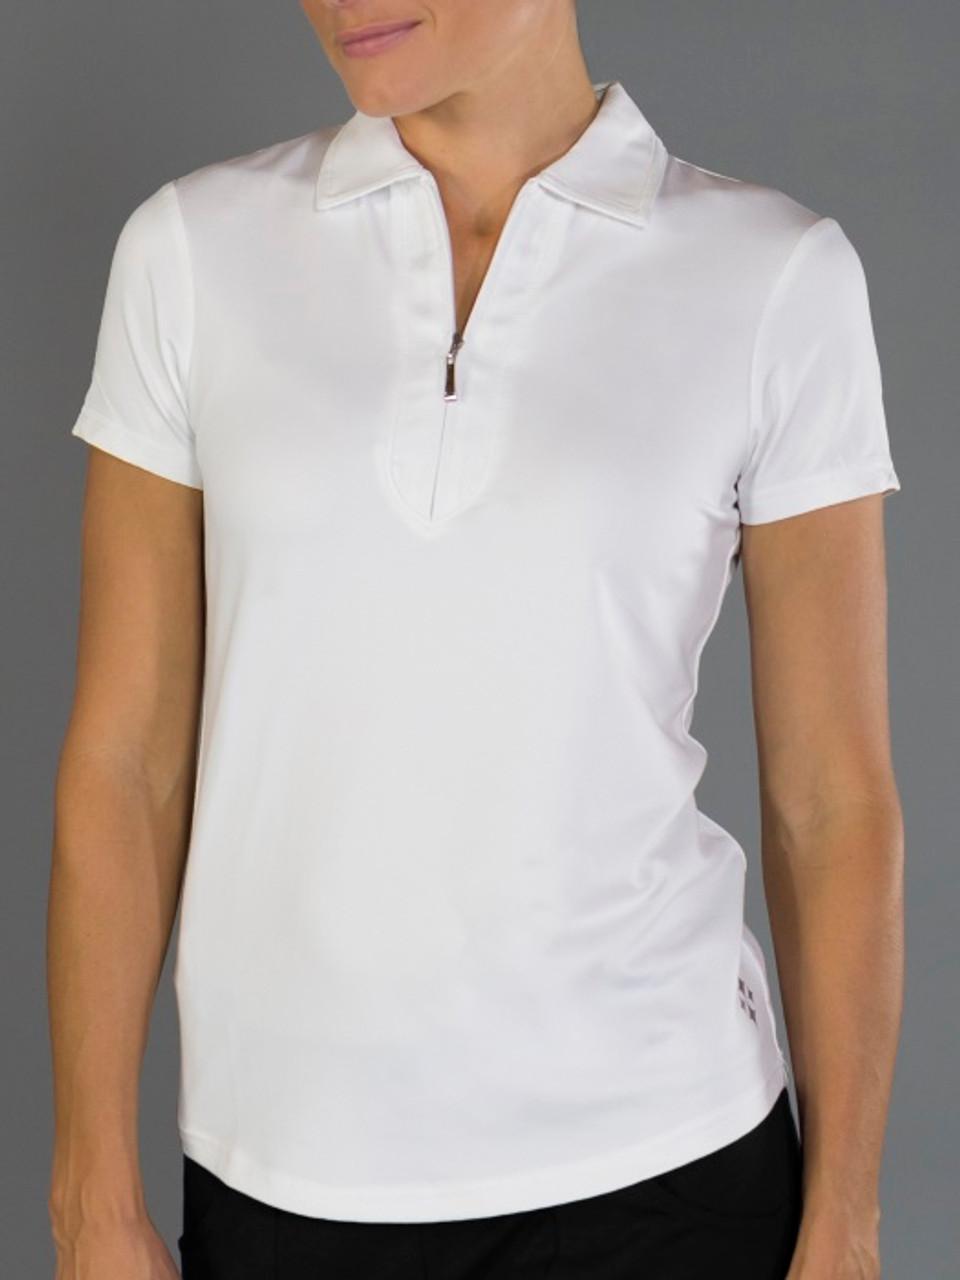 112a5d5e8eb588 JoFit Ladies Jacquard Performance Polo Tennis Shirts - Bali (White)